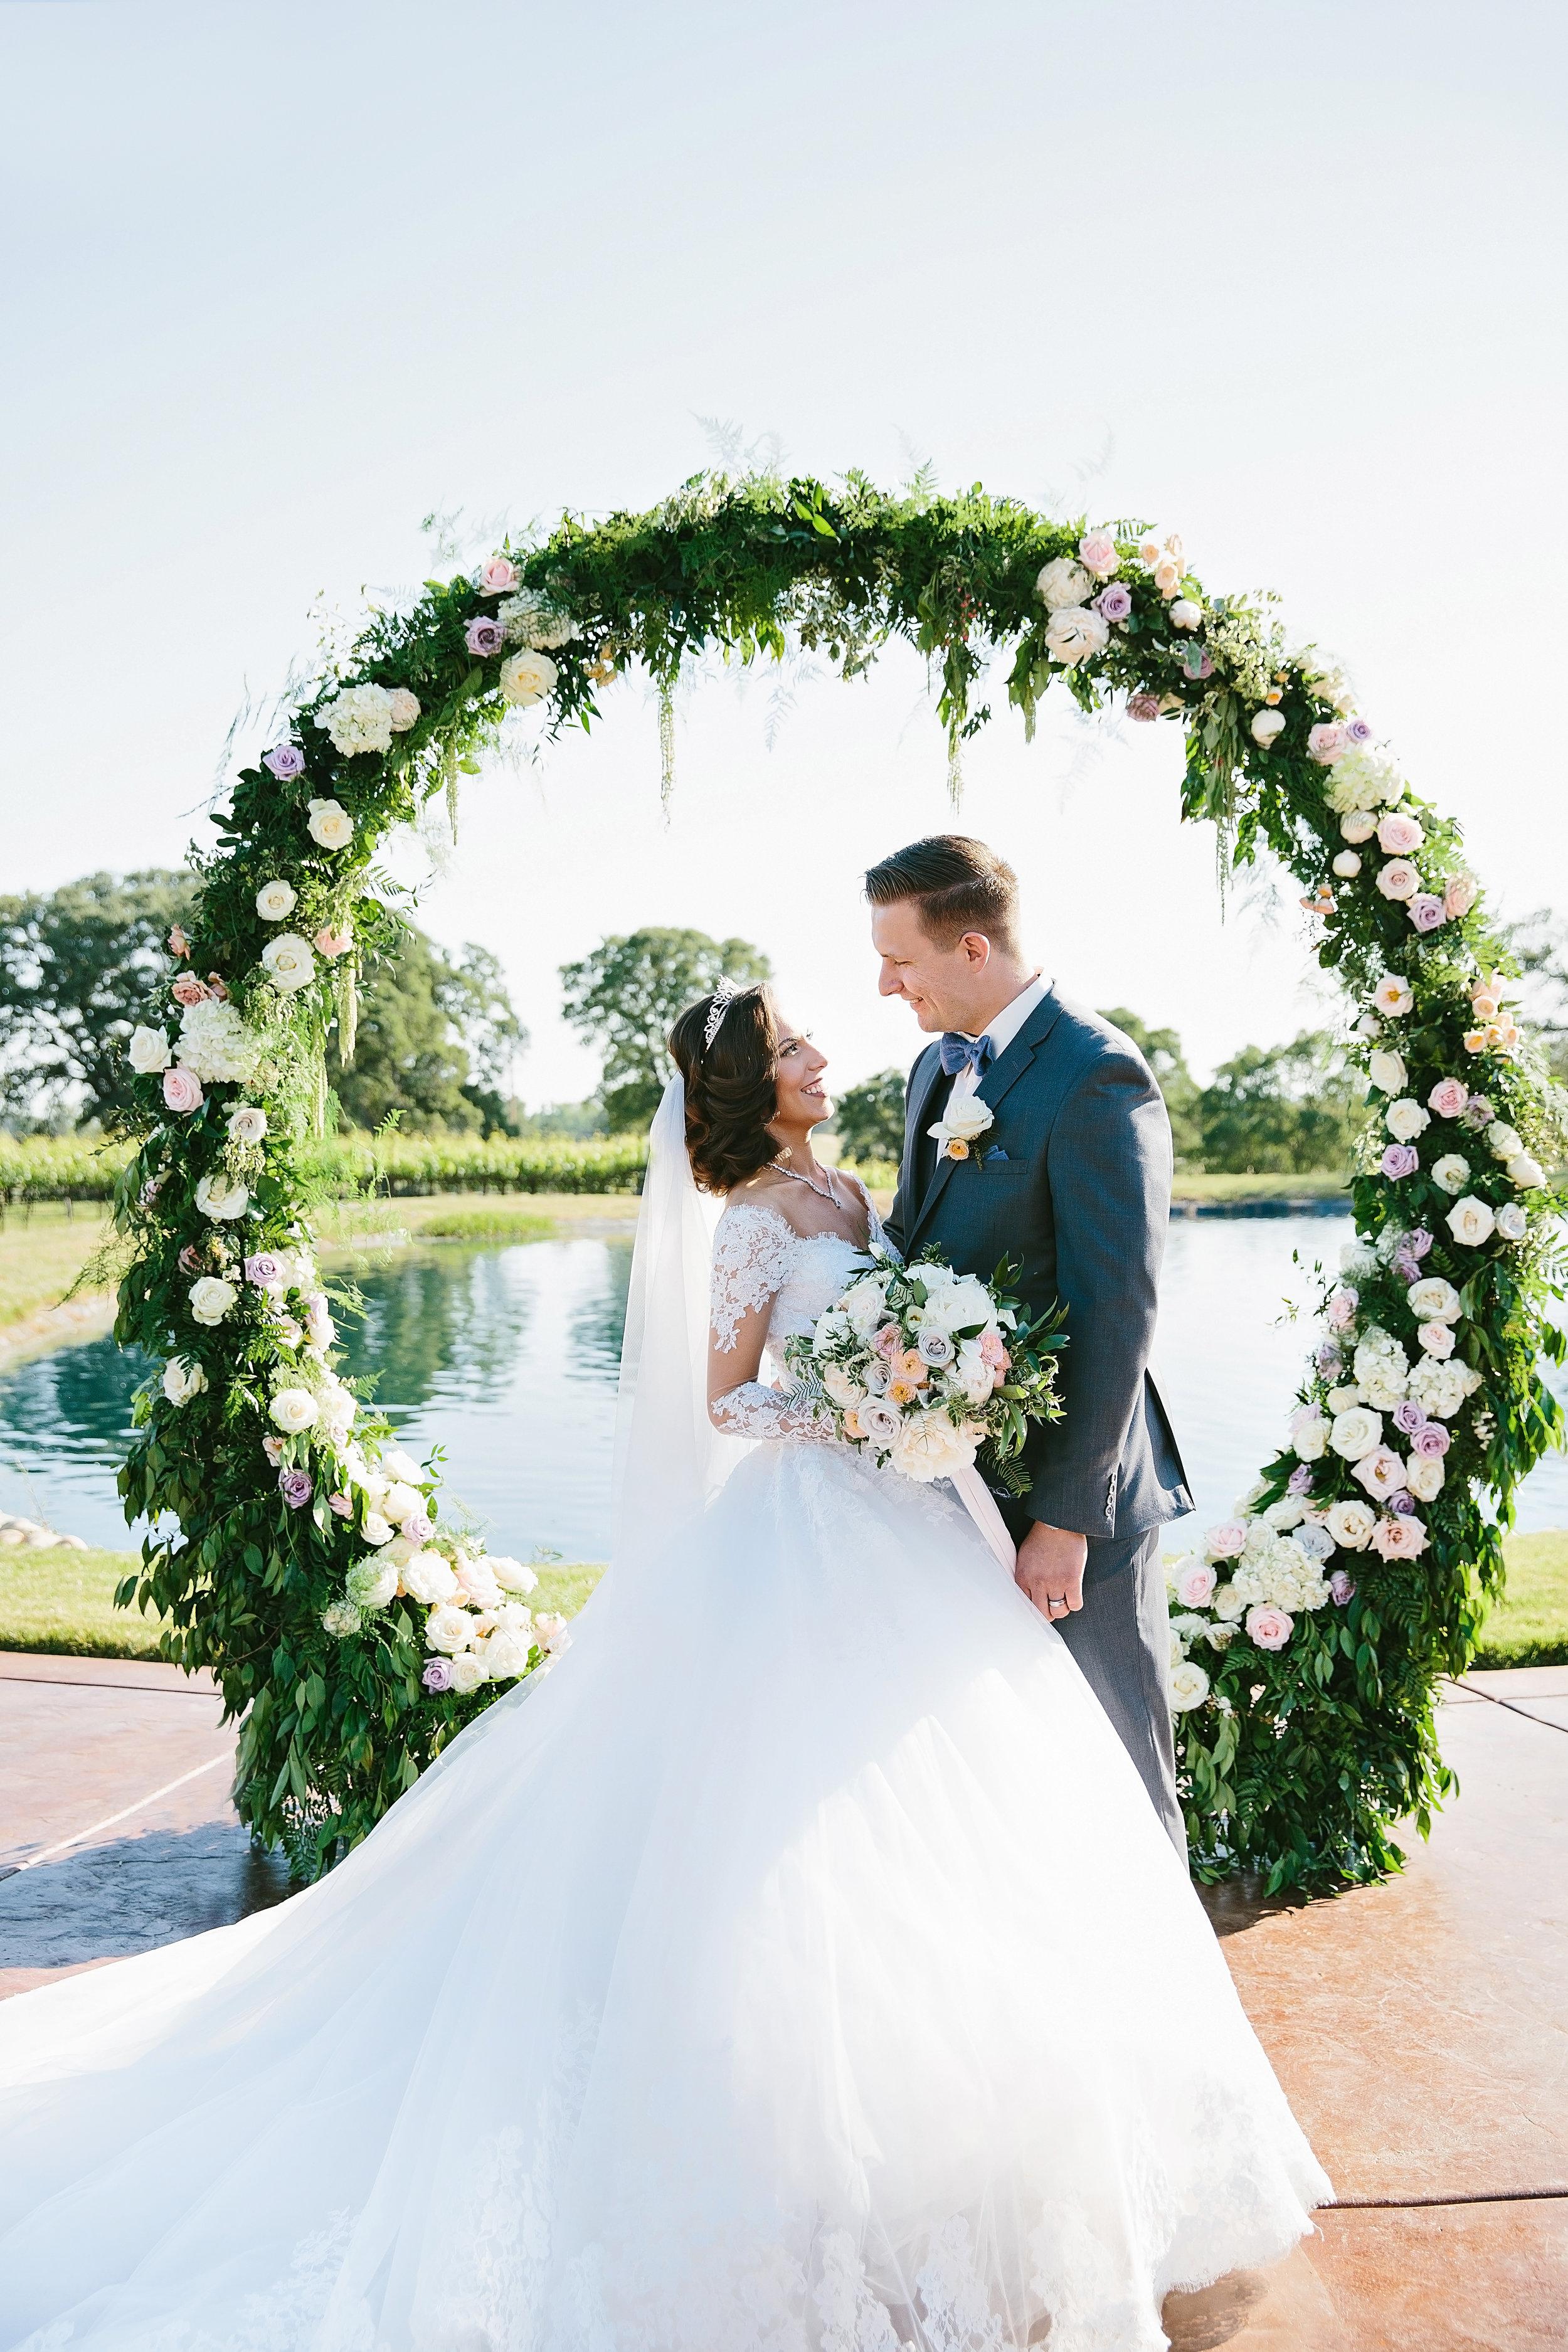 Violette-fleurs-event-design-roseville-anna-perevertaylo-rancho-robles-vinyards-Beautiful-Flowers-Destination-Elegant-Classic-Blush-Decor-ceremony.jpg